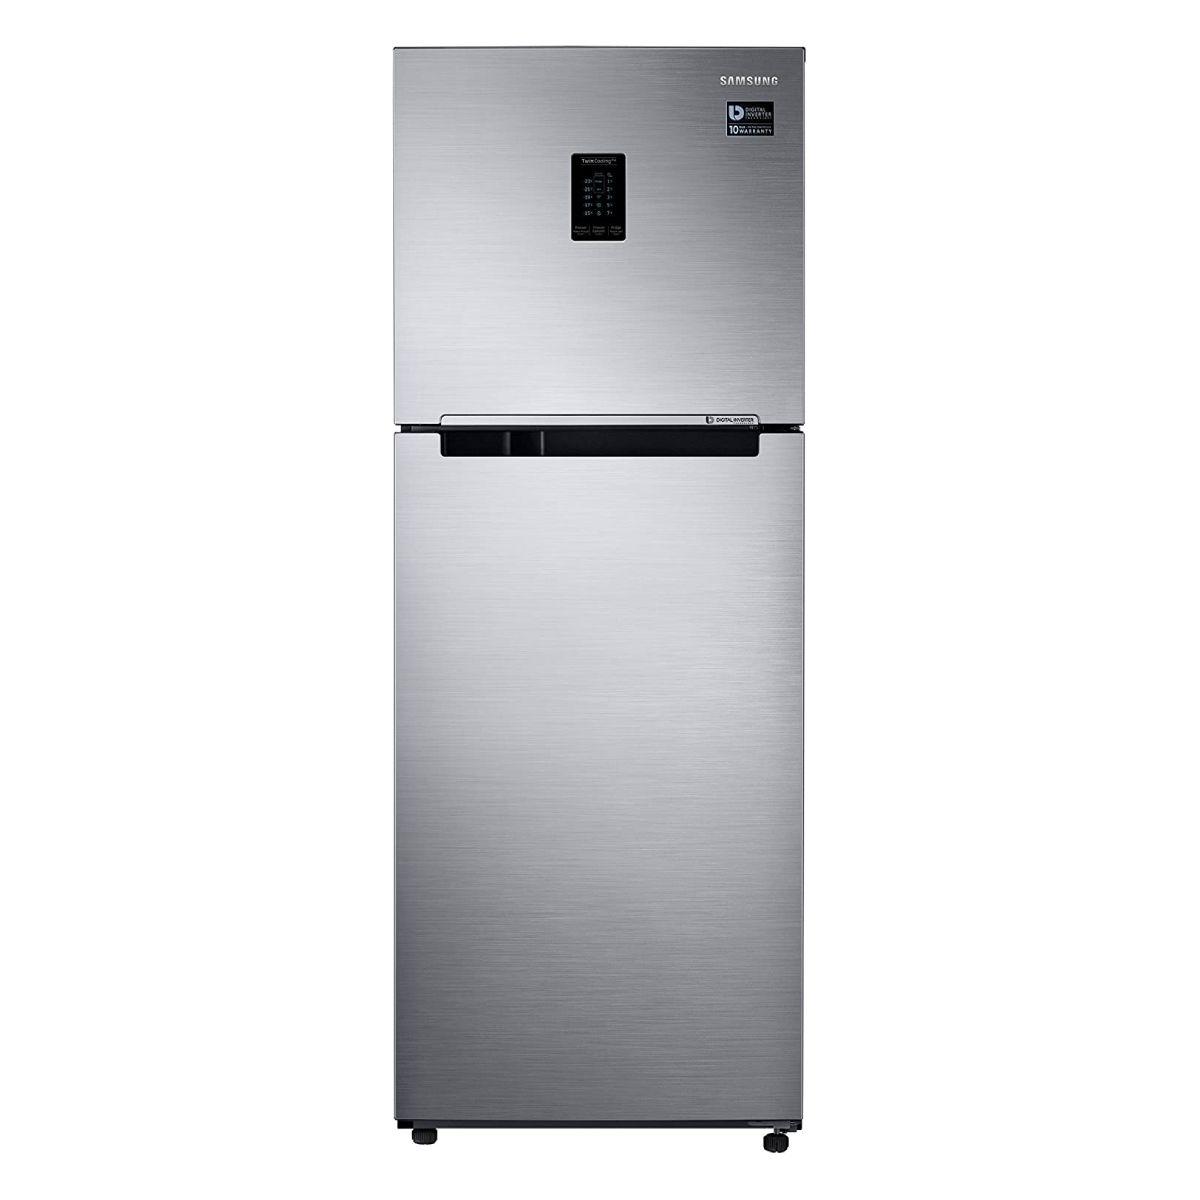 Samsung 324 L 2 Star Inverter Frost Free Double Door Refrigerator (RT34M5538S8/HL)